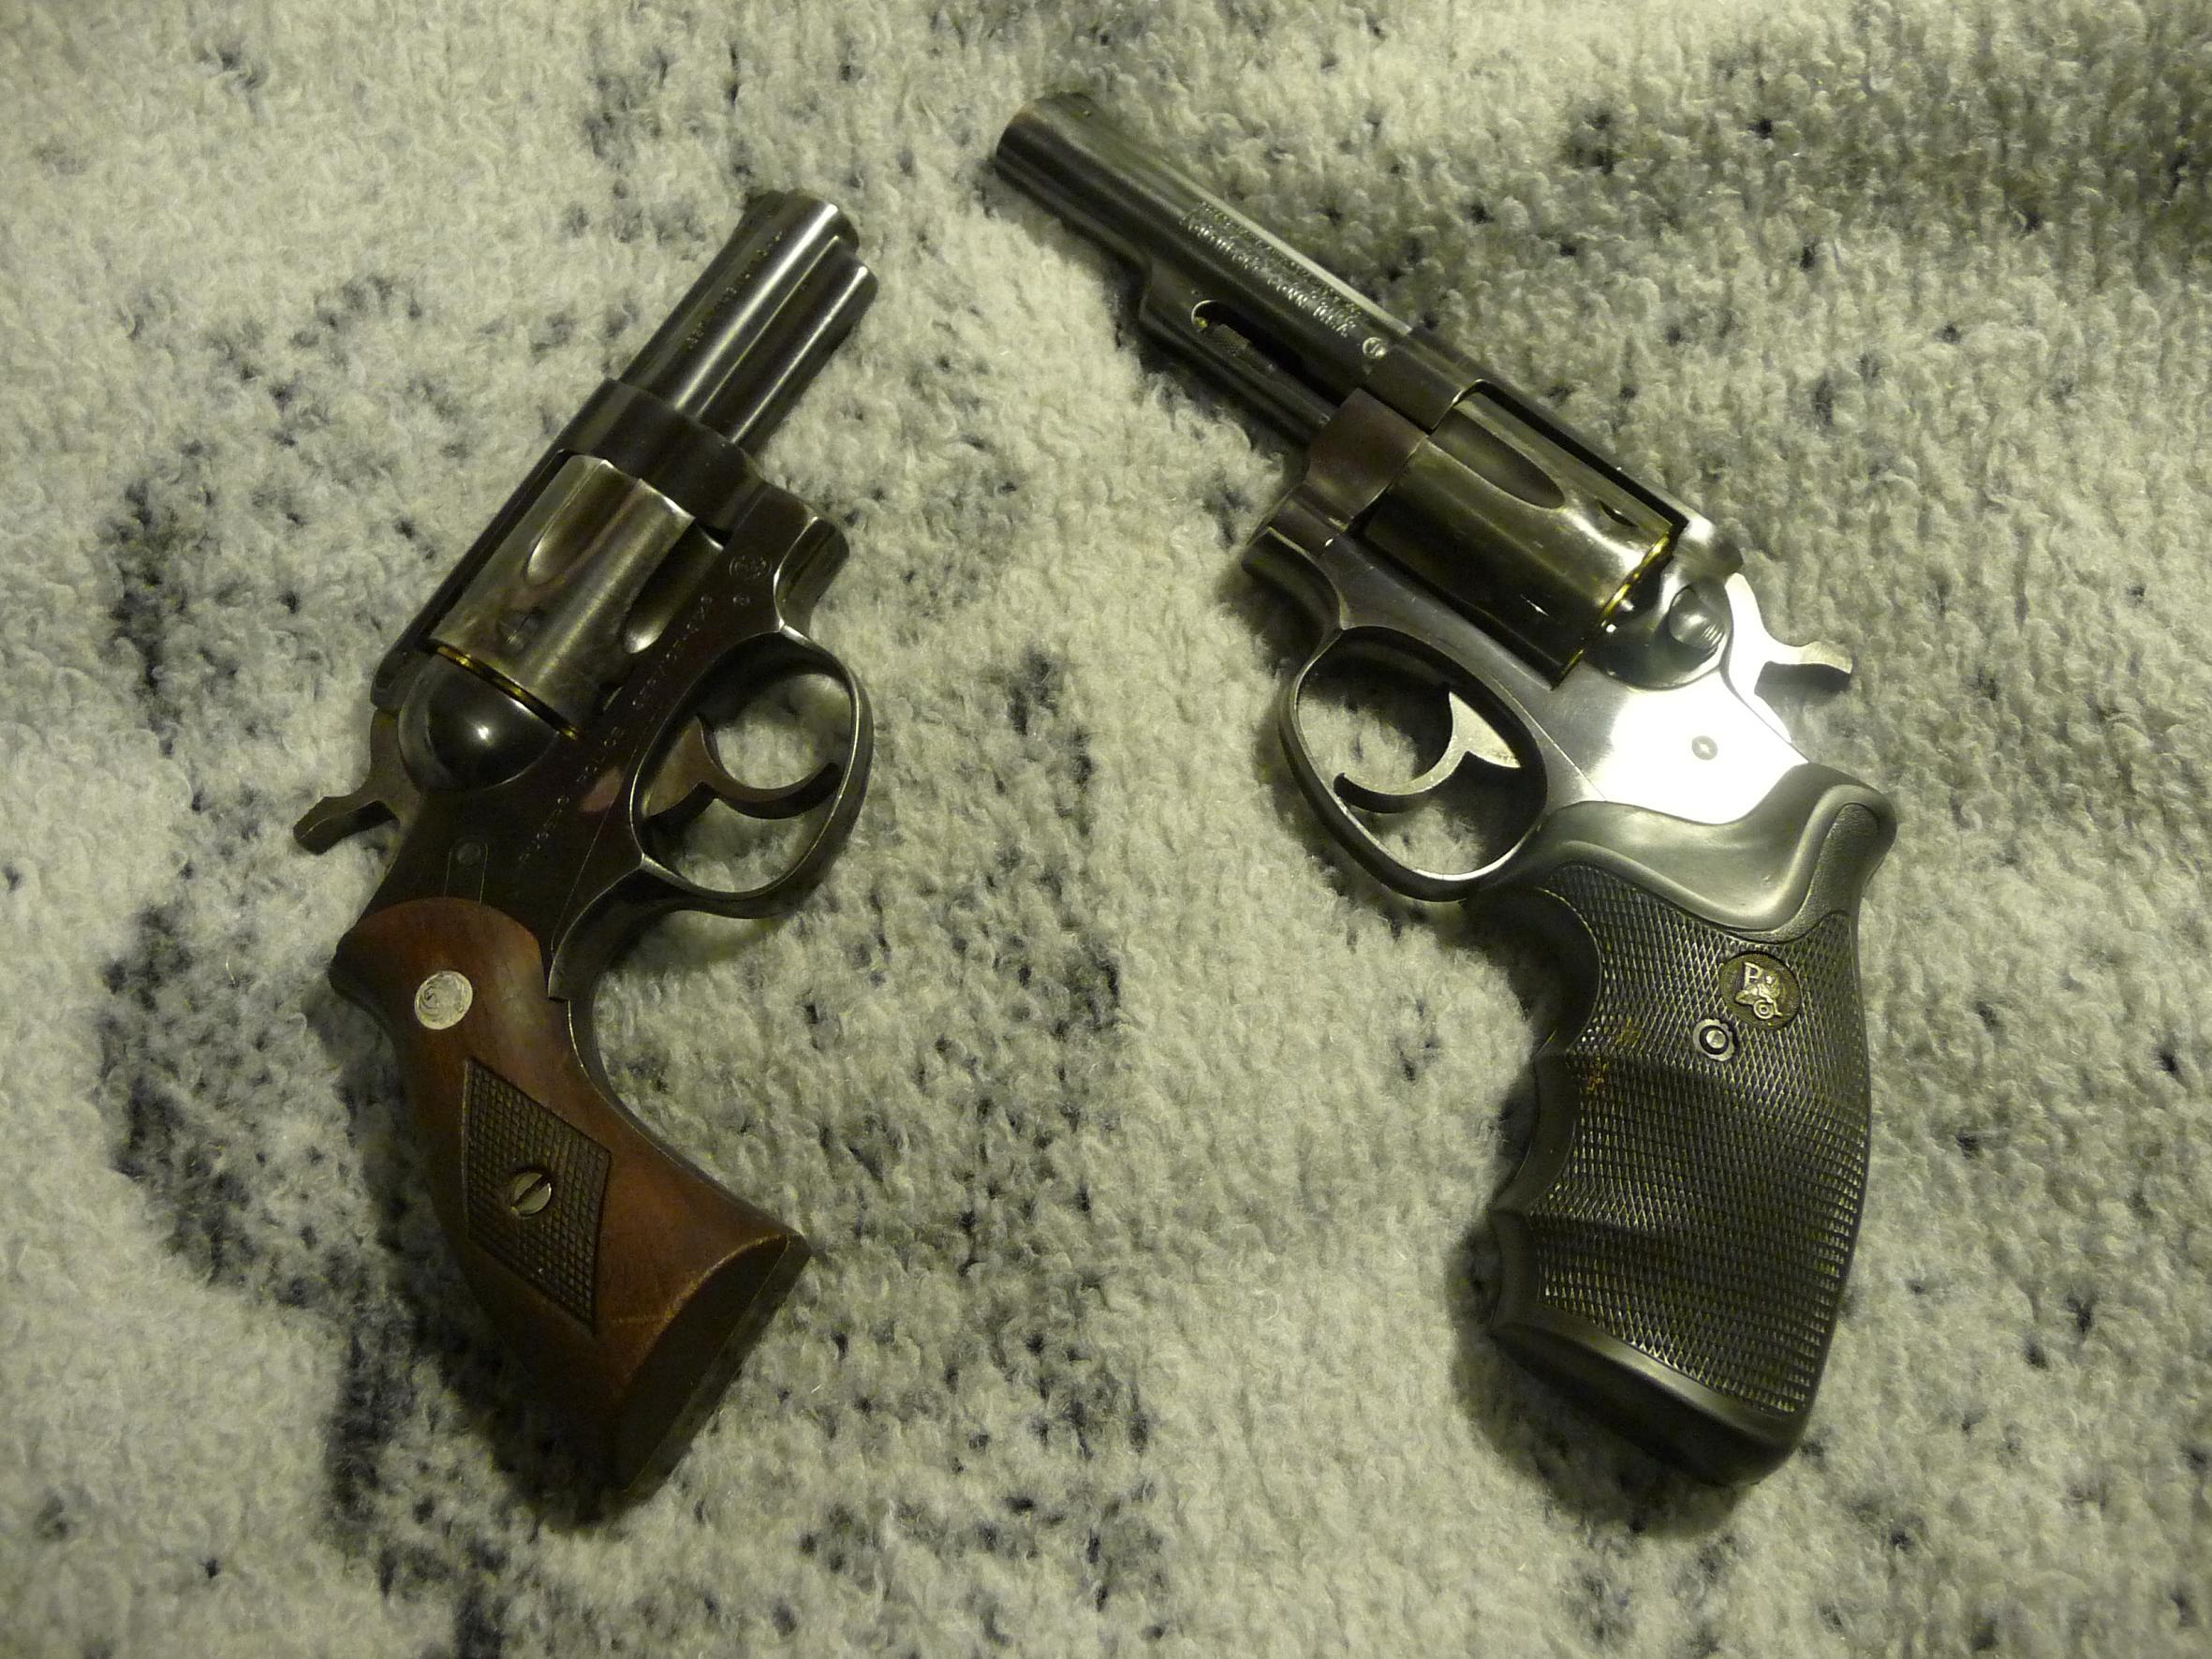 A Look at Forum Members' .357 Magnums-p1030804.jpg